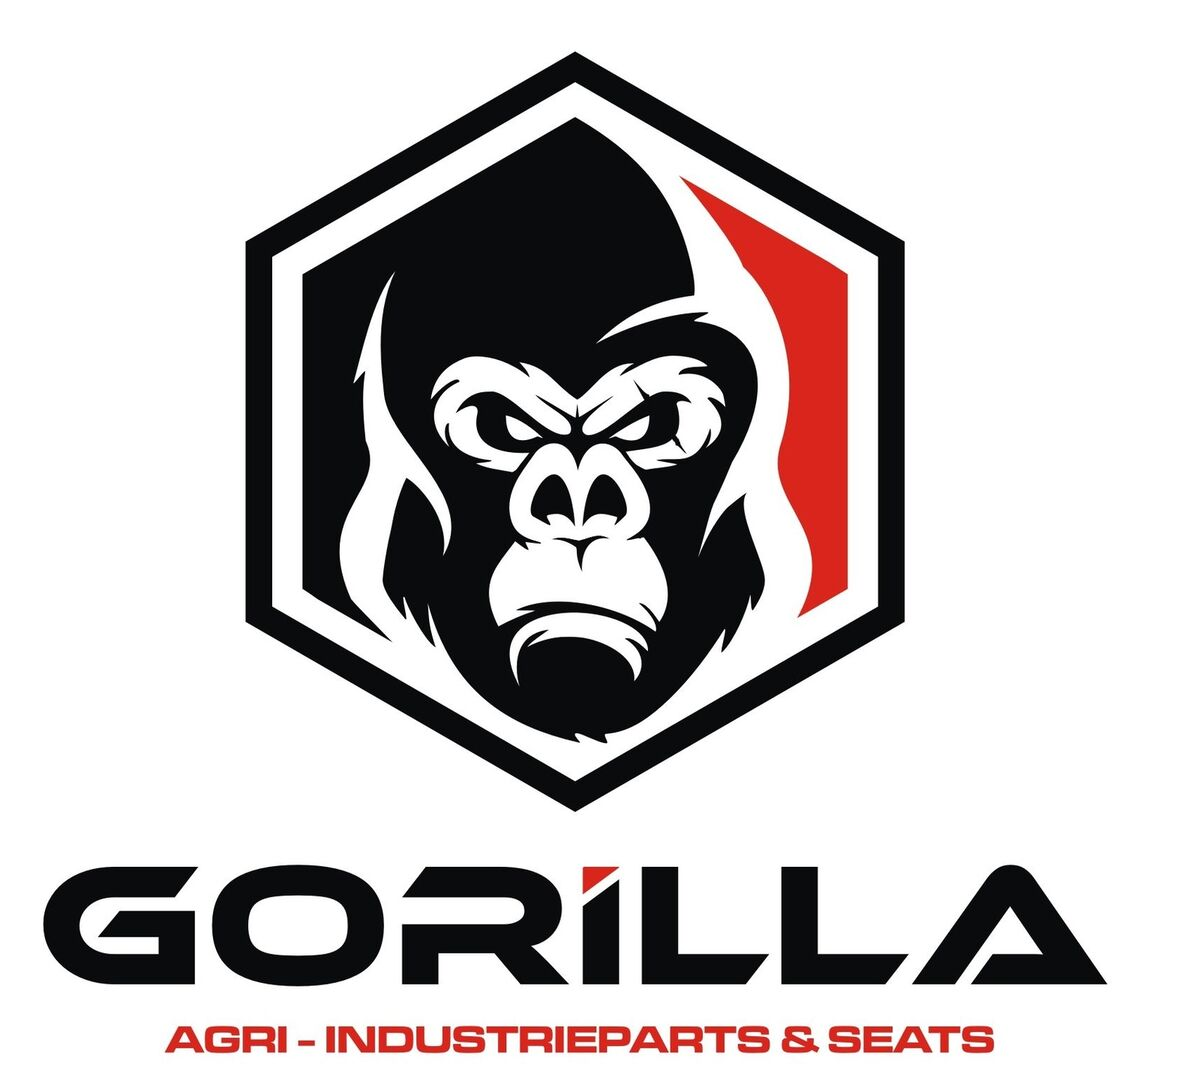 Gorilla GmbH